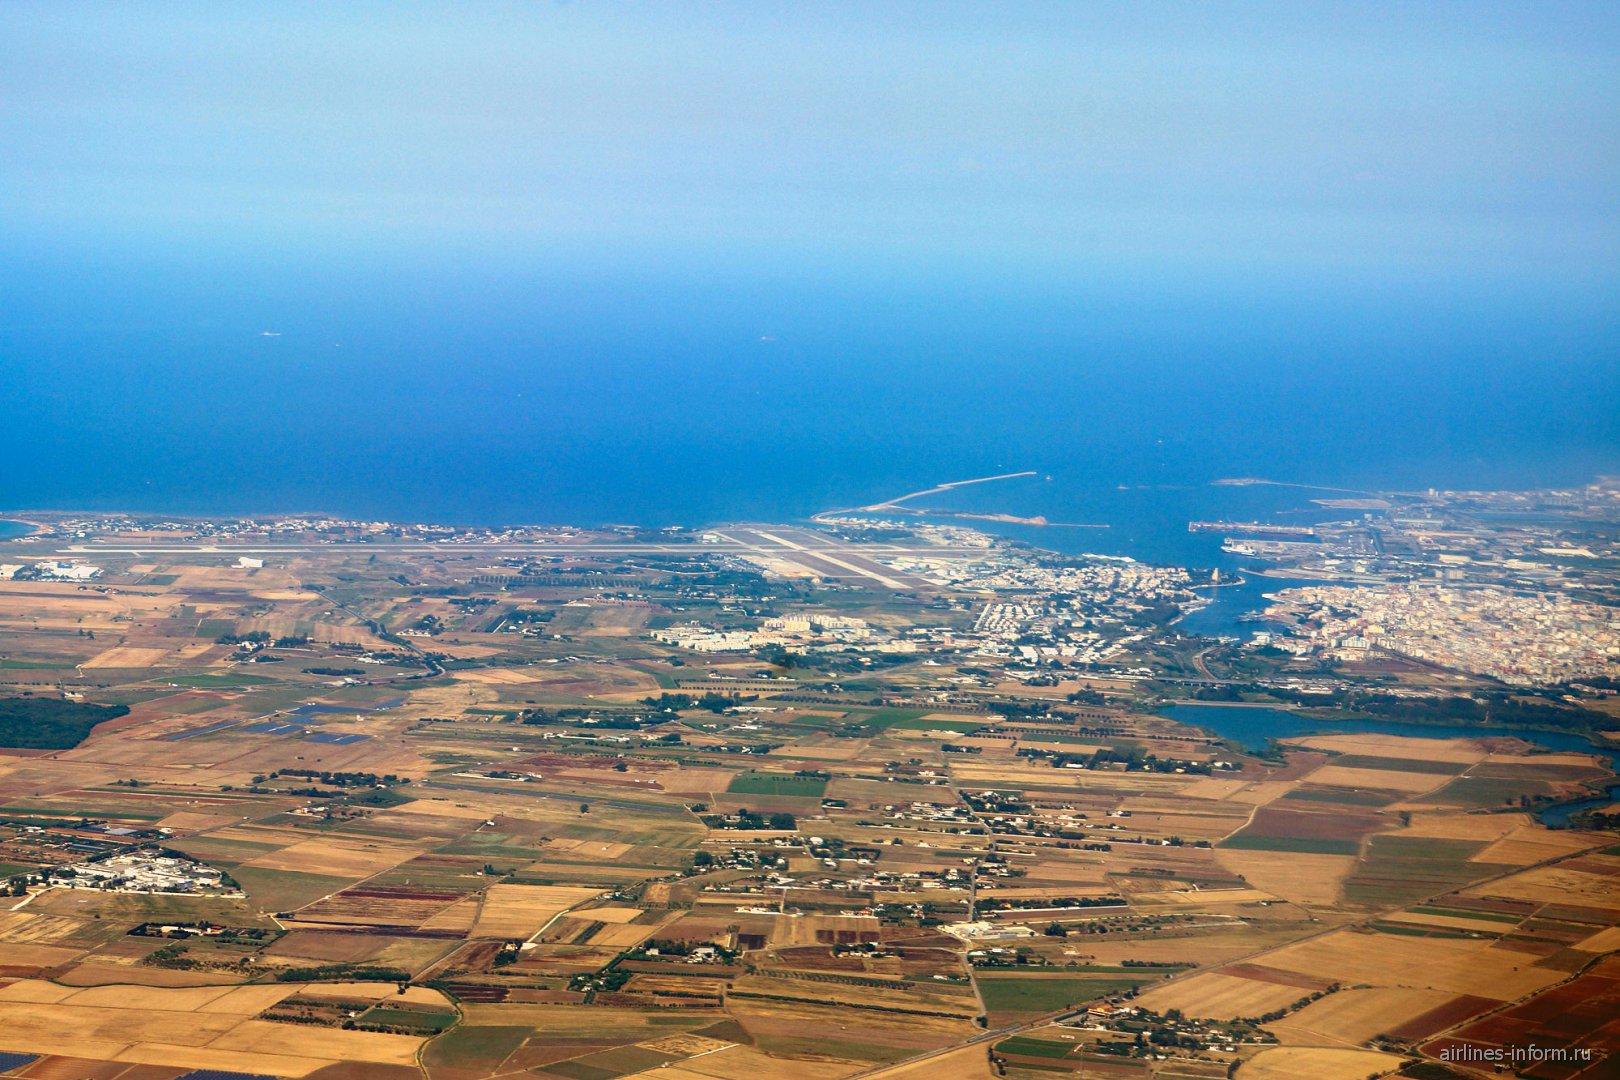 Аэропорт (слева) и город (справа) Бриндизи